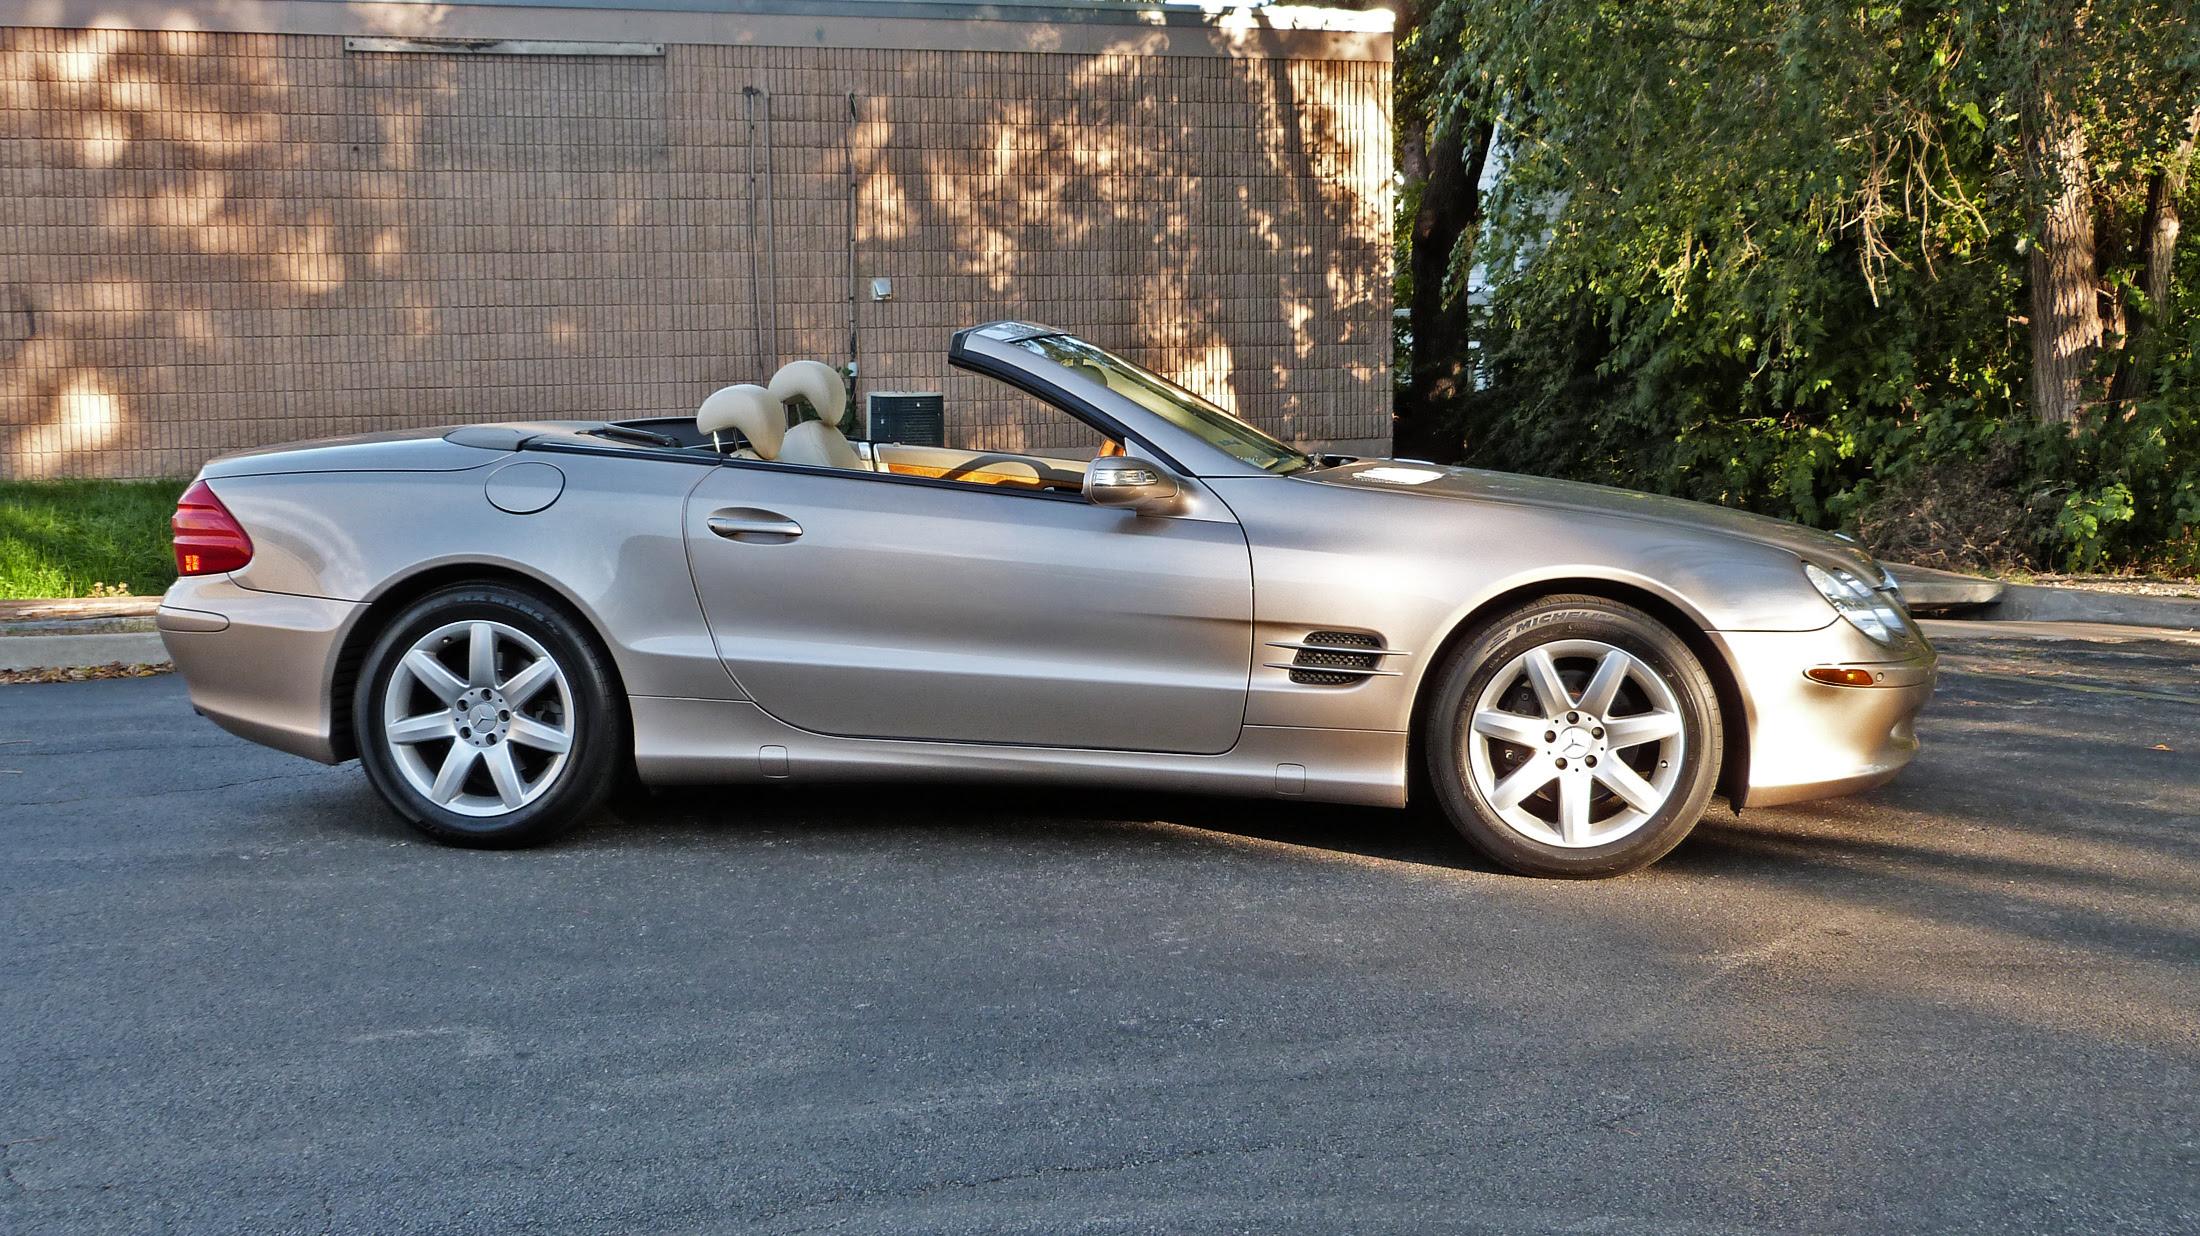 Mercedes SL500 | Santa Fe Auto Sound